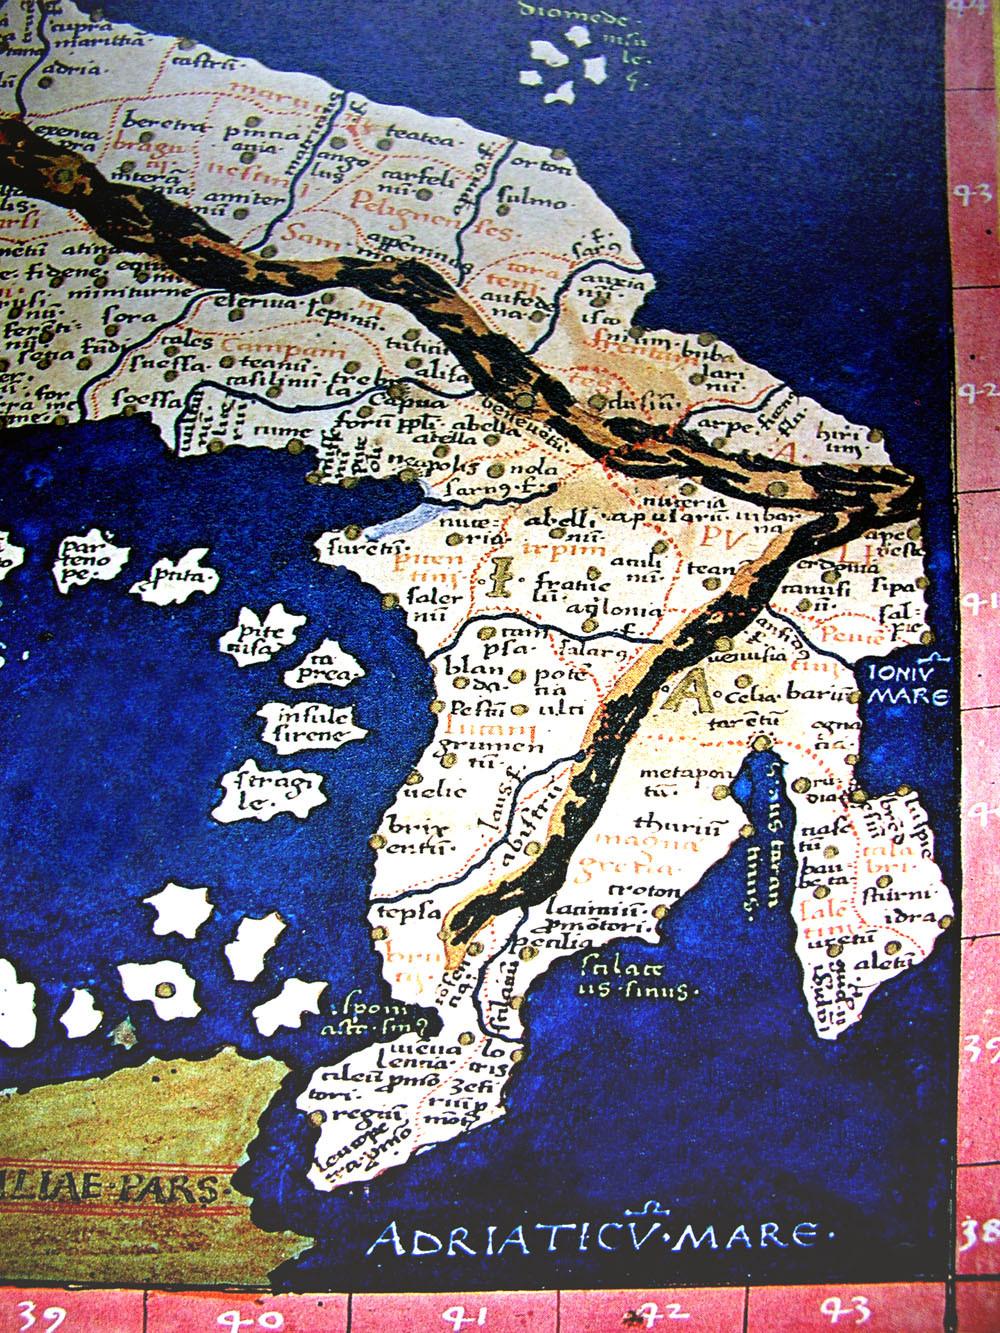 Carta tolemaica (dalla pagina Facebook Monumenta Cartographica Calabriae).